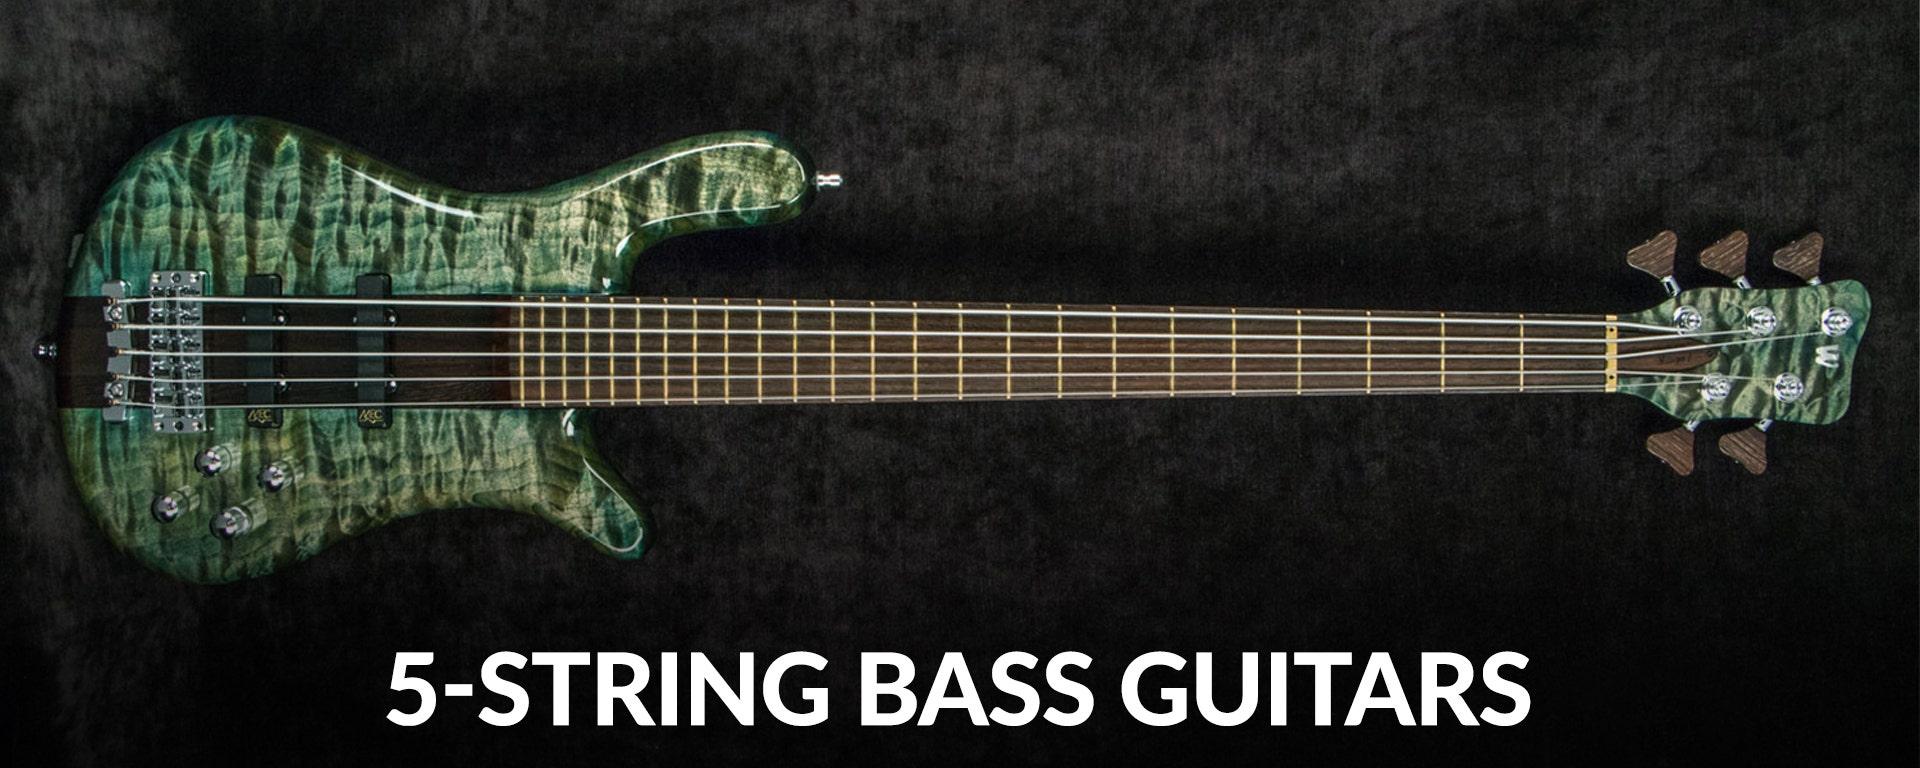 Shop 5-string electric bass guitars at Sam Ash